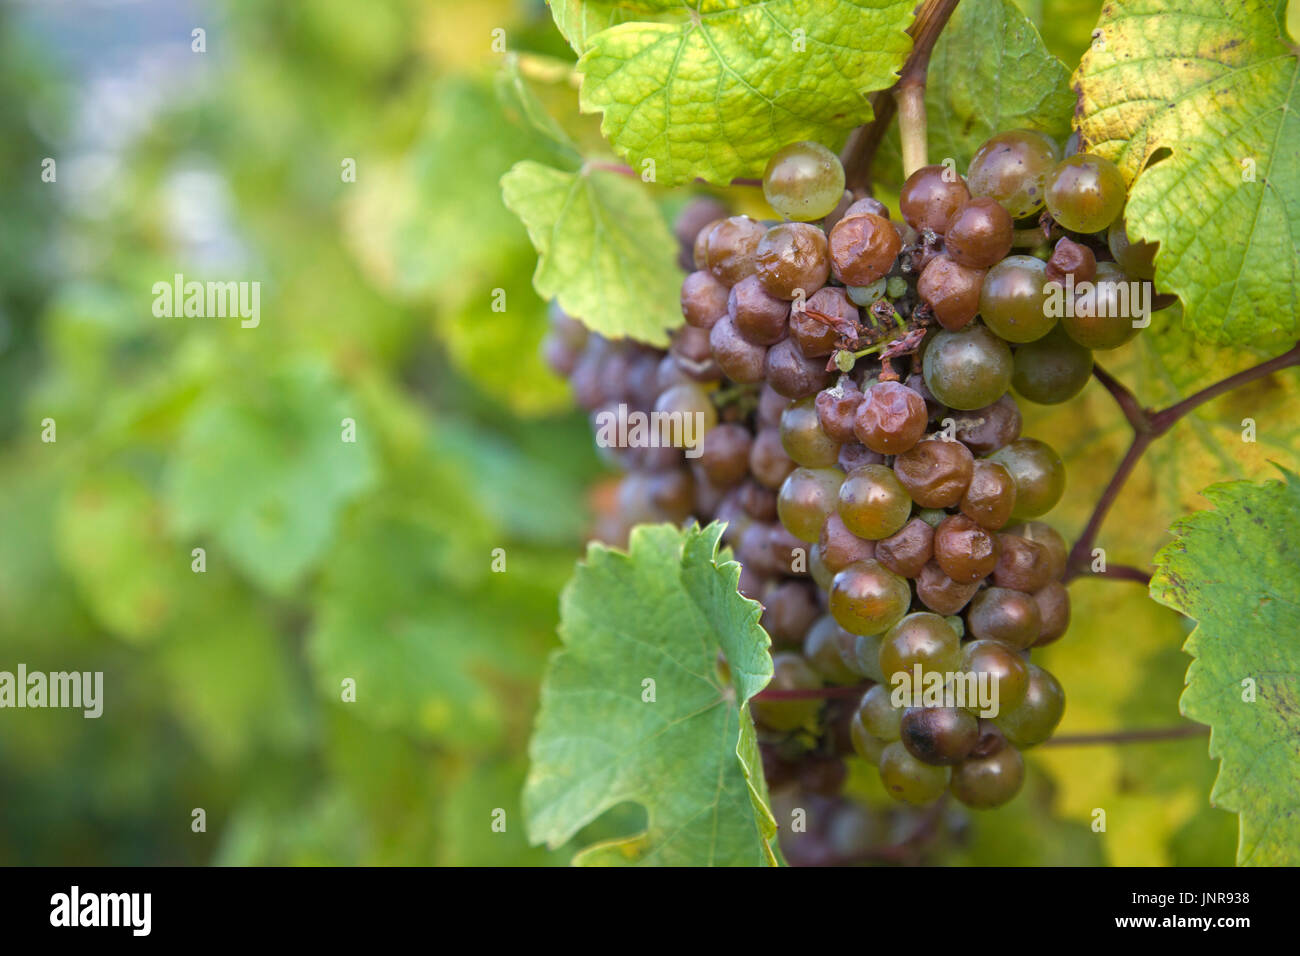 Blaue Weintrauben am Rebstock, Bernkastel-Kues, Mittelmosel, Rheinland-Pfalz, Deutschland, Europa | Grapes at the Stock Photo